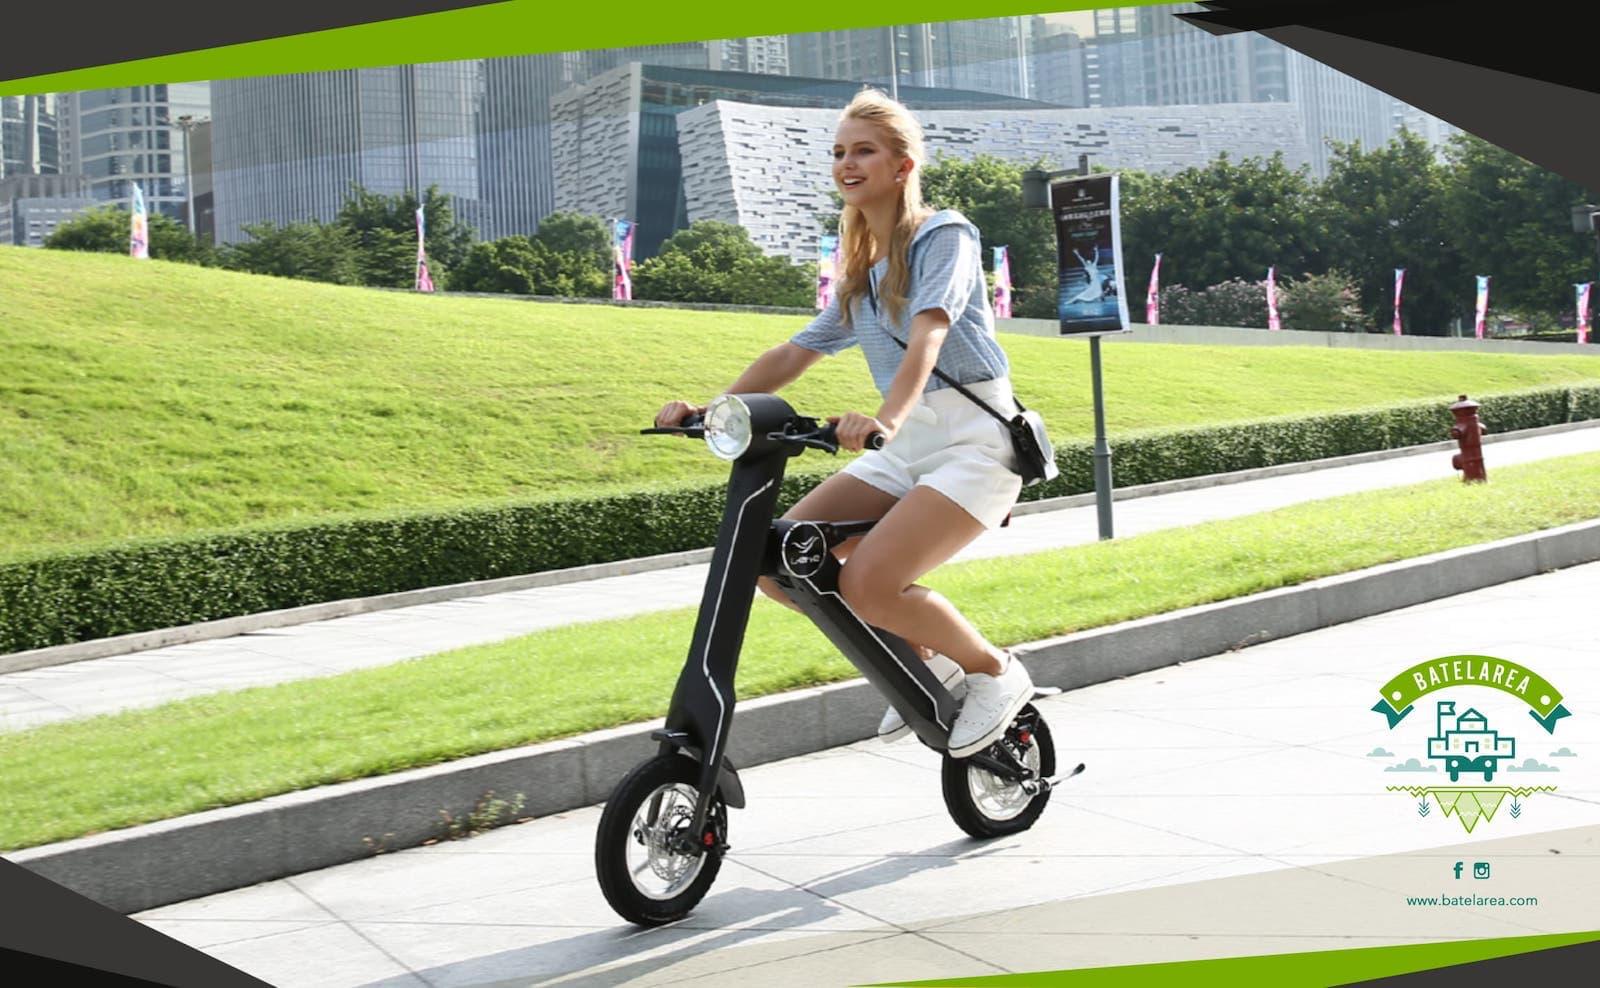 comprar scooter electrica en Vigo